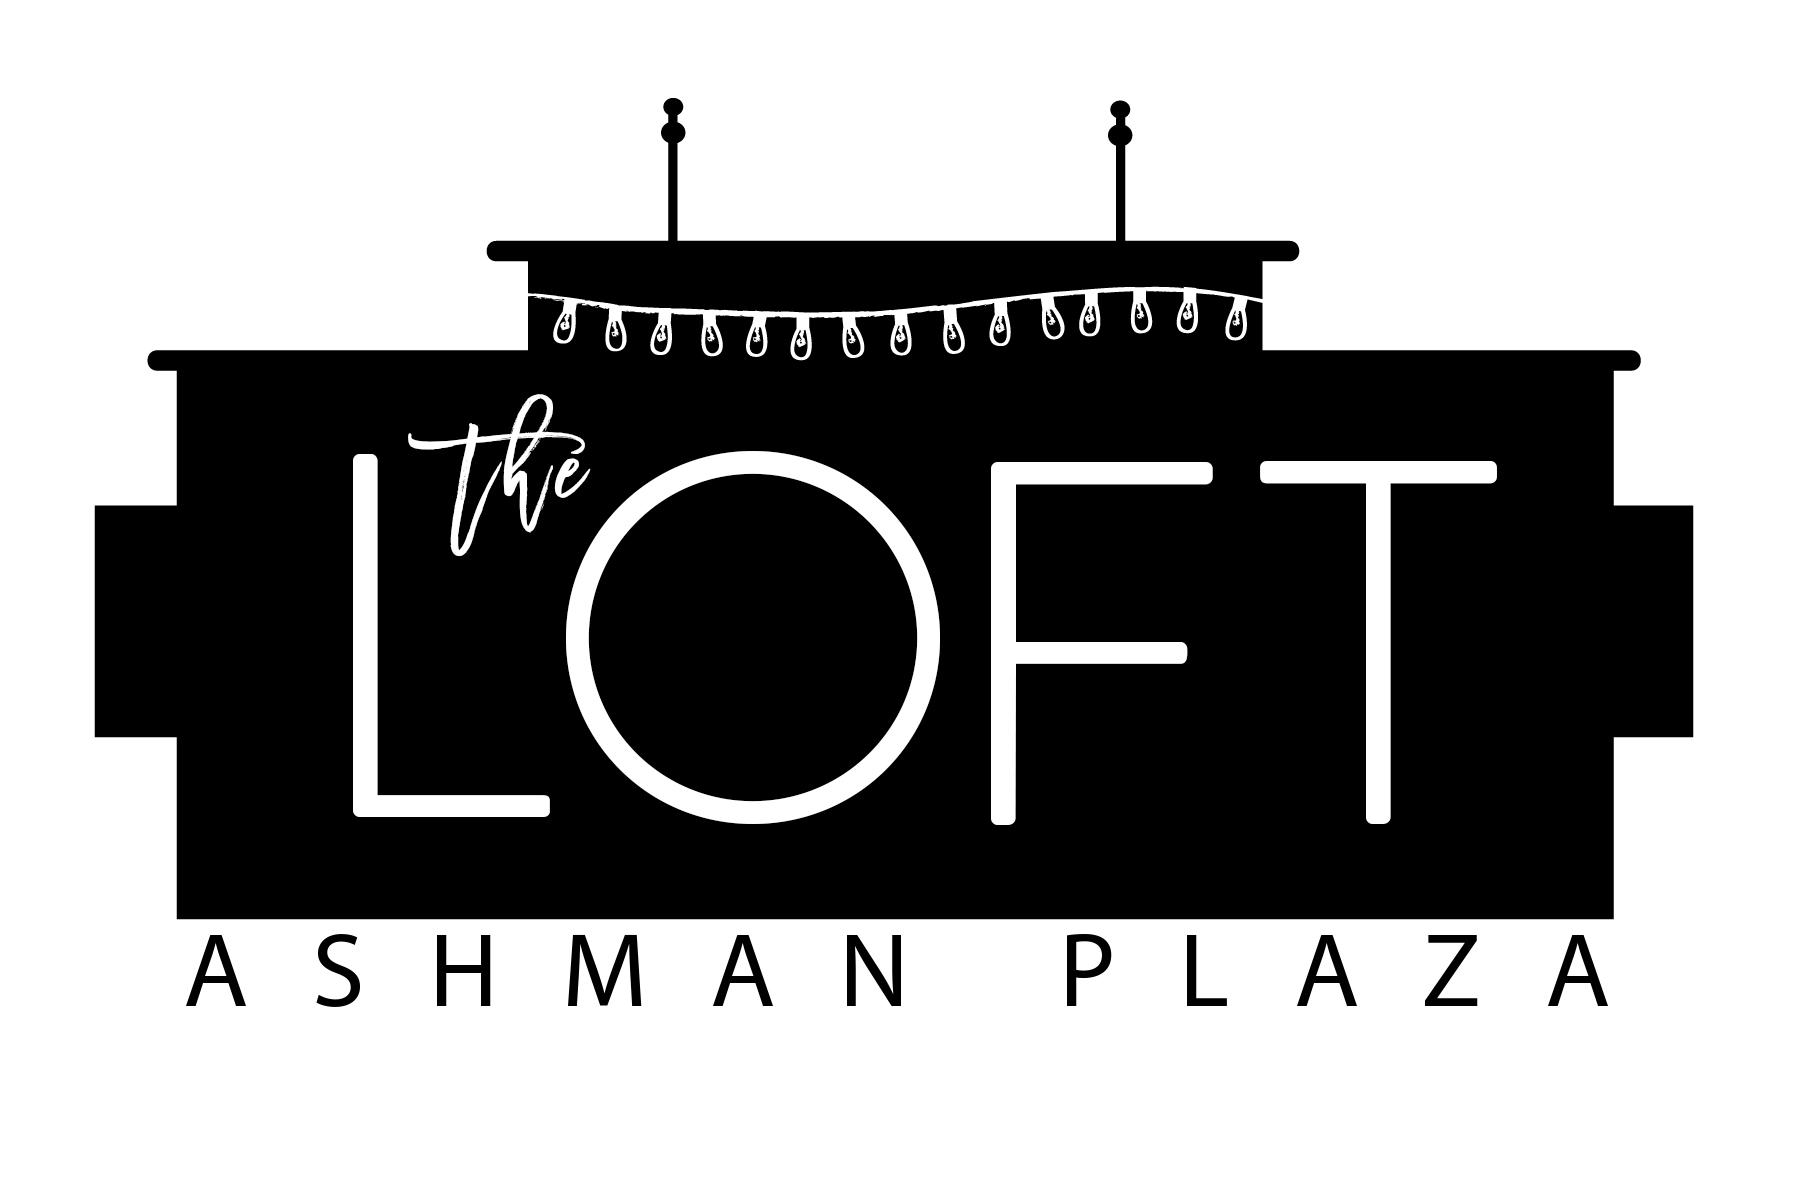 The Loft at Ashman Plaza, Midland, MI, Michigan, Dance, Swing Dancing, Fitness Classes, Jazzercise, Kickboxing, Piyo, Yoga,